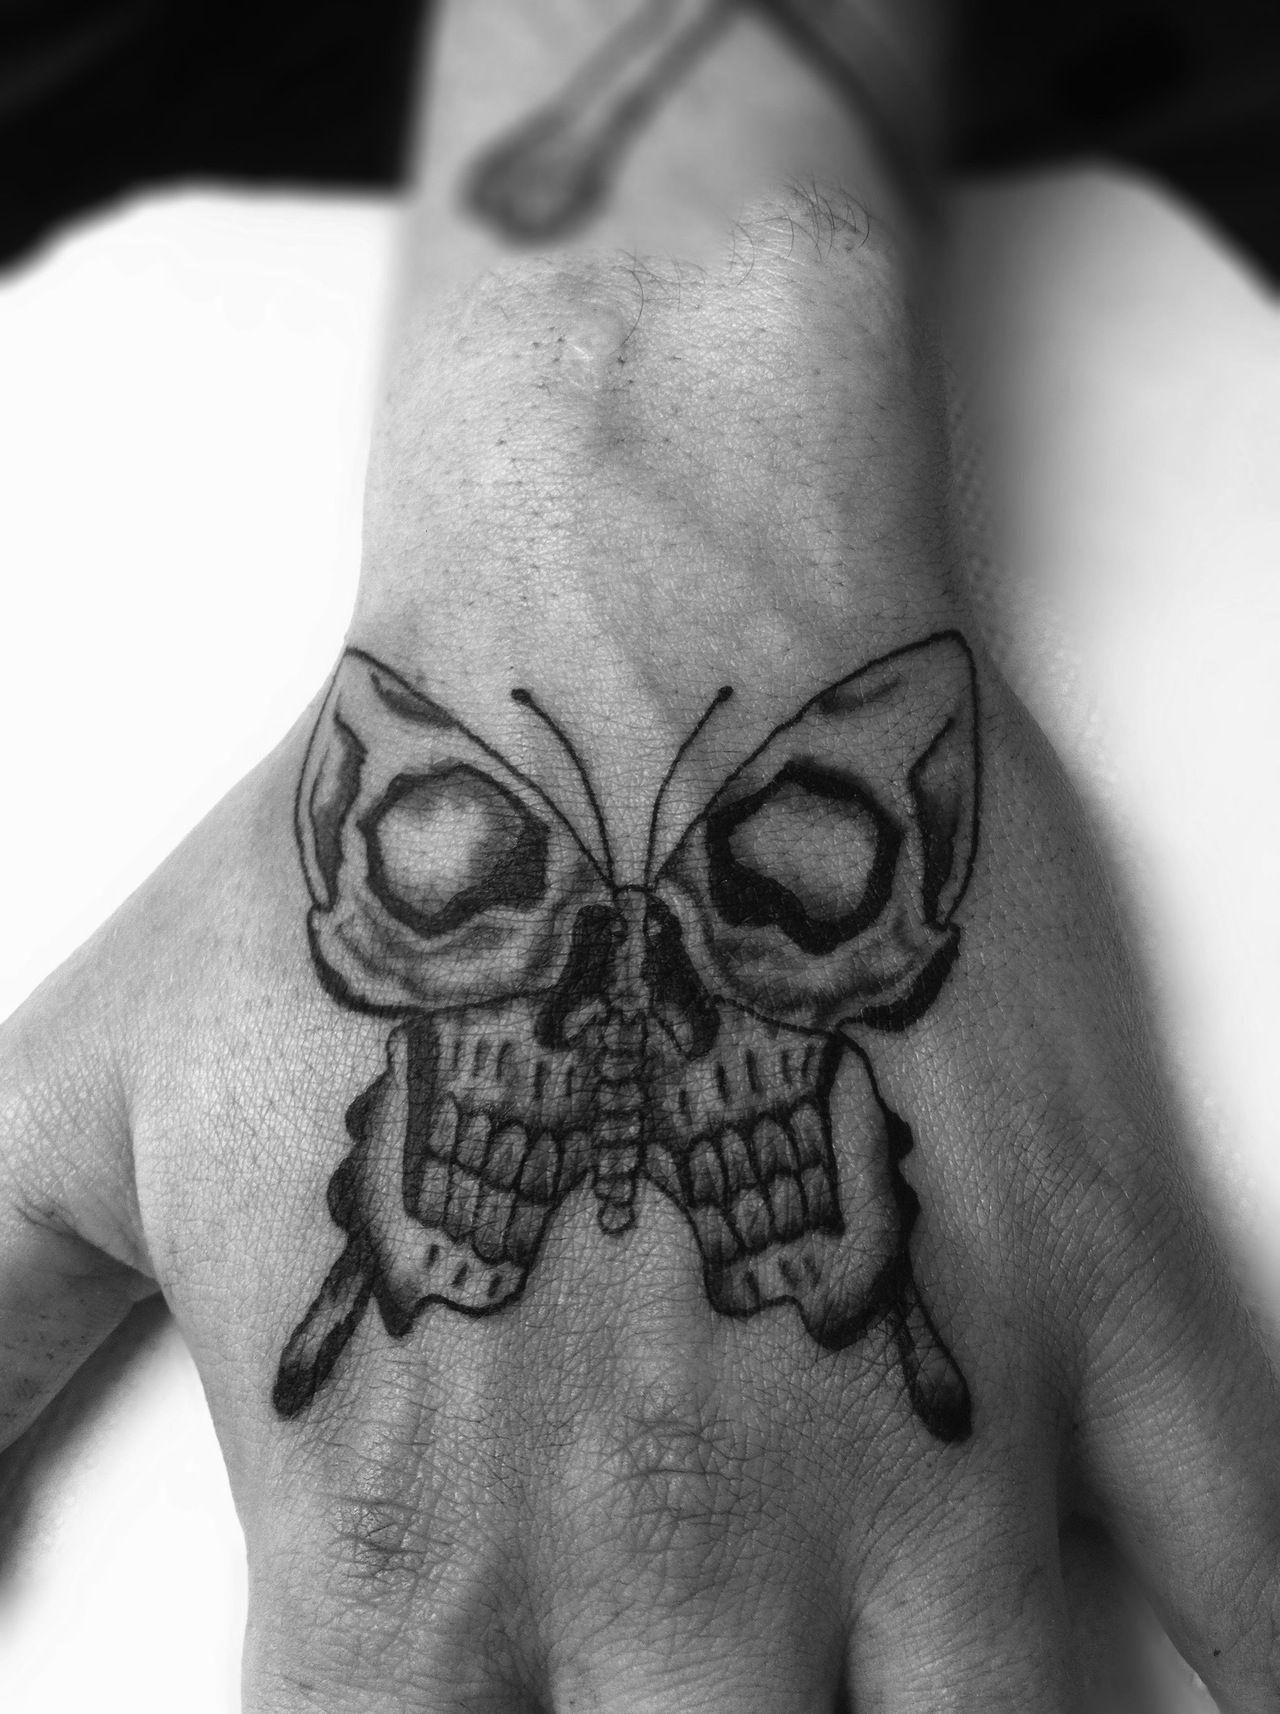 Hand tattoos tattoo ideas hands body art tattoo s floral tattoo - Skull Wings Grey Ink Moth Tattoo On Left Hand Moth Tattoos